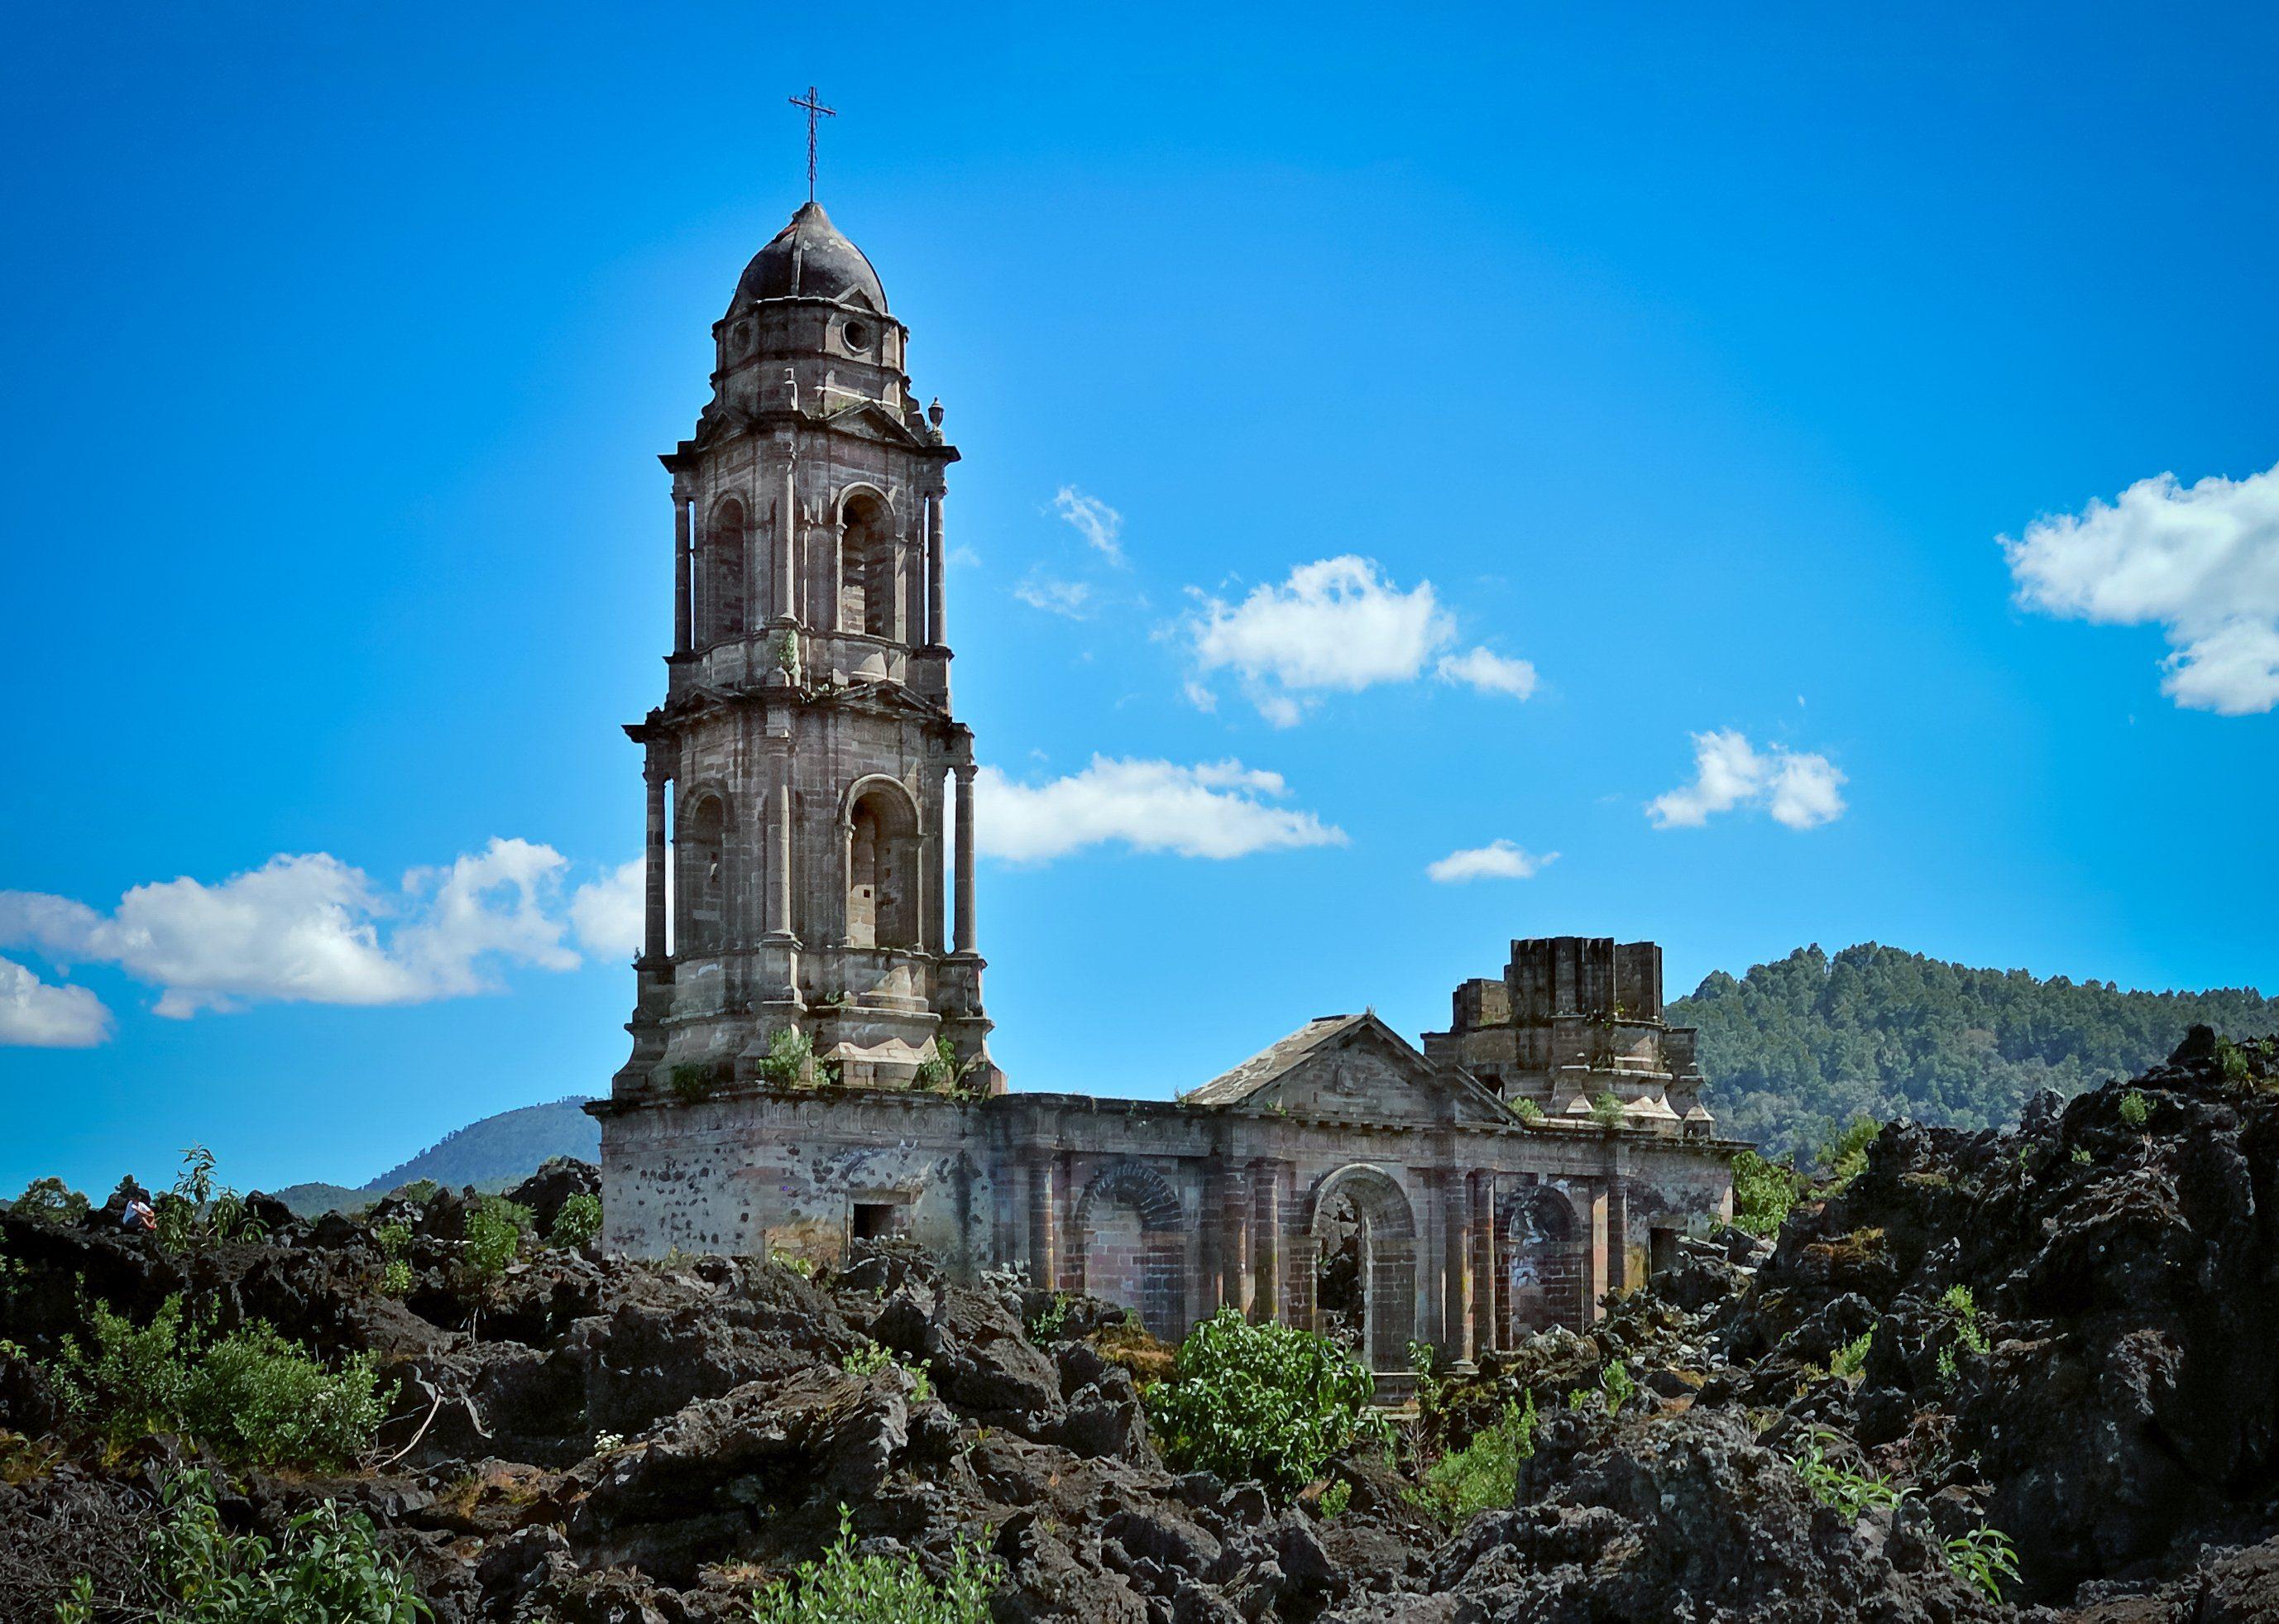 San Juan Parangaricutiro Mexico